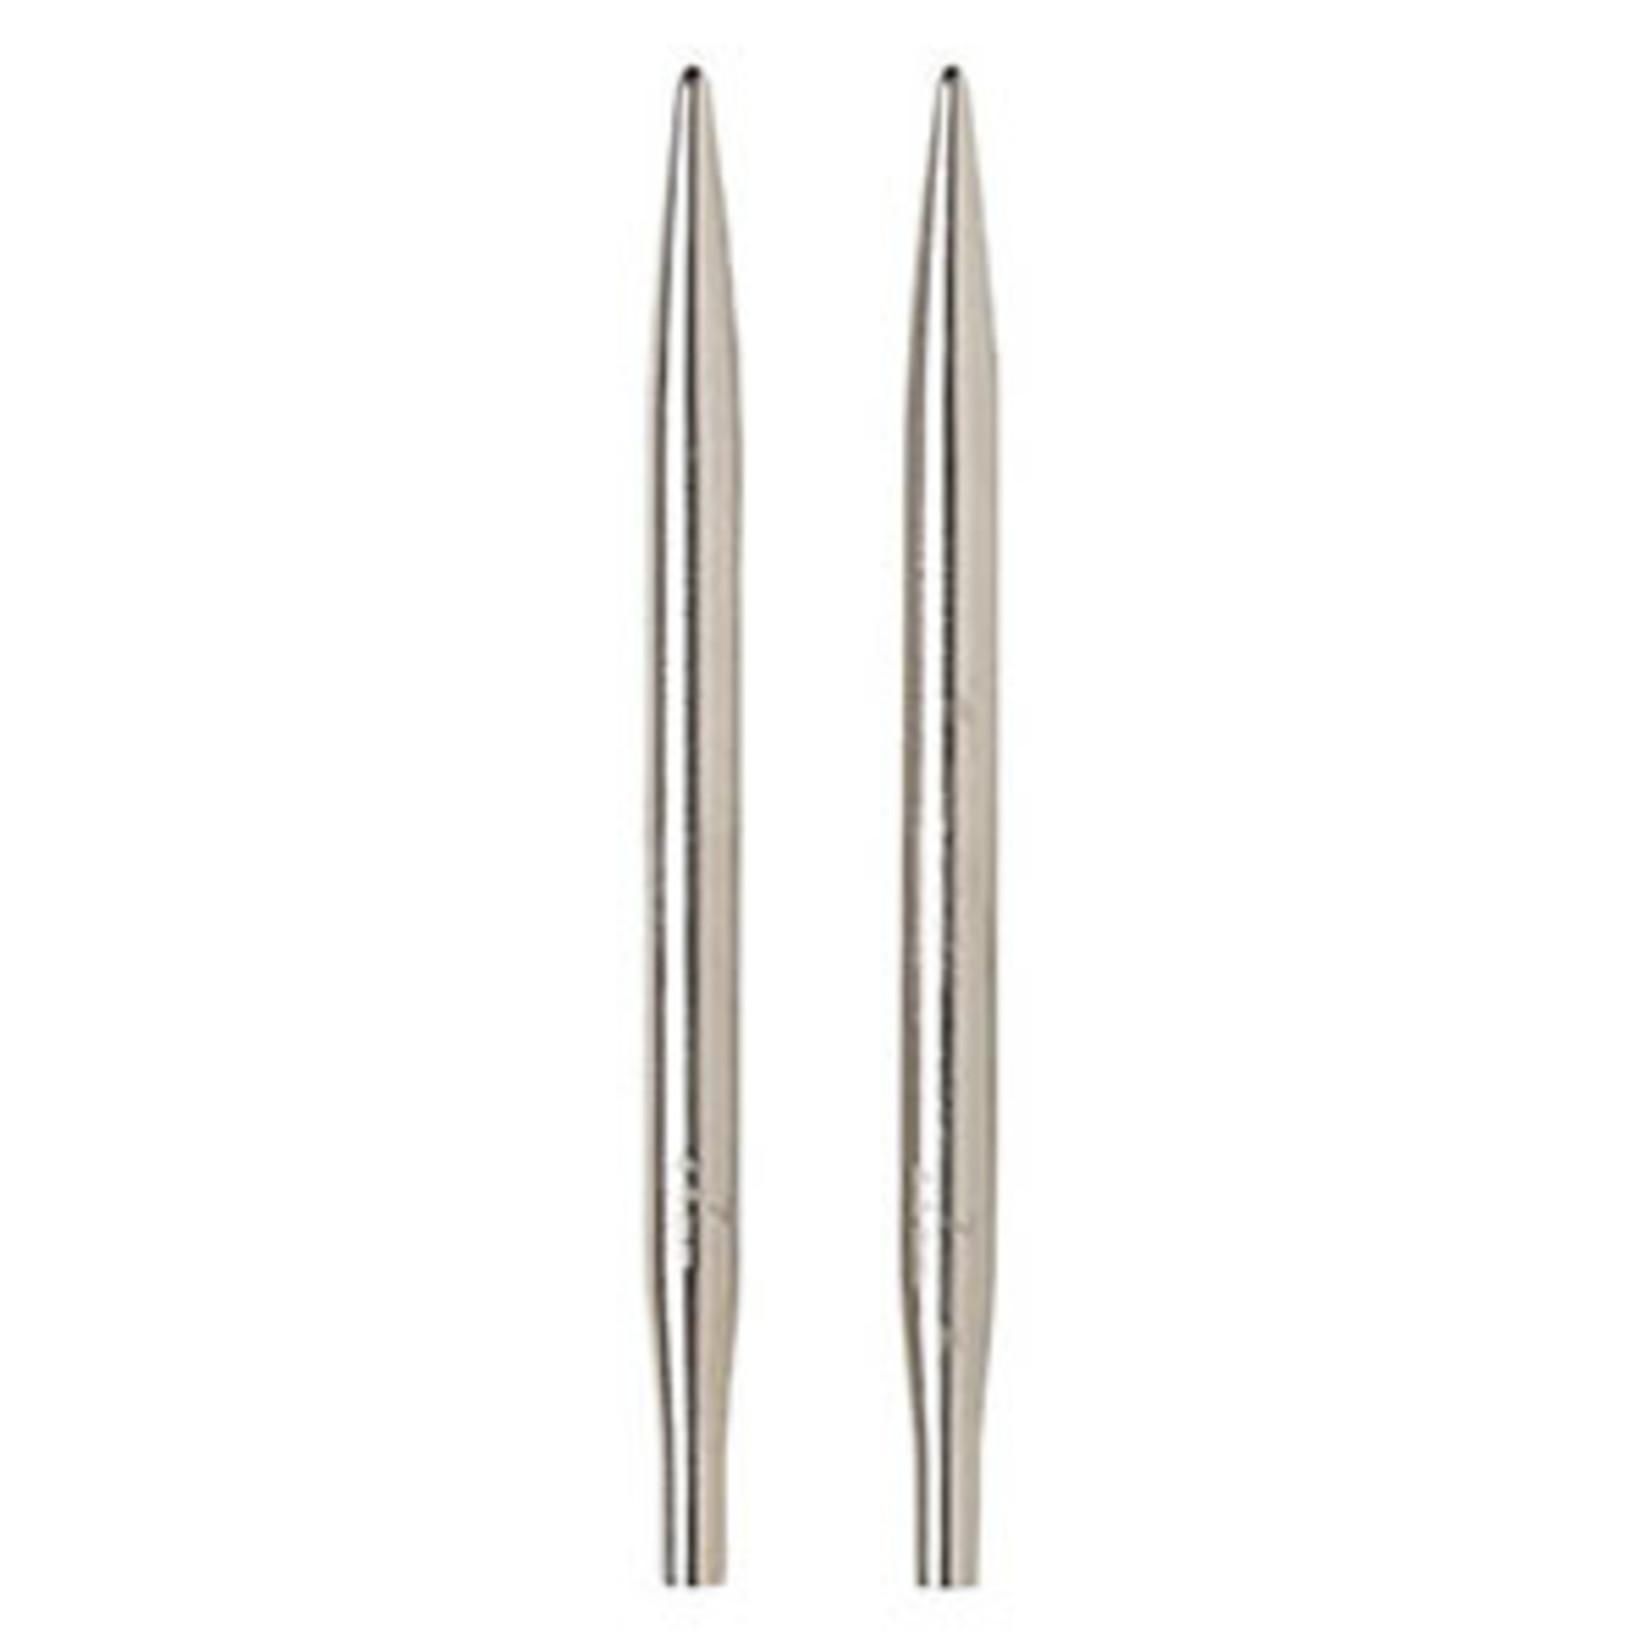 "Knit Picks KNIT PICKS Nickel Plated Interchangeable Circular Needle Tips 12cm (5"")"